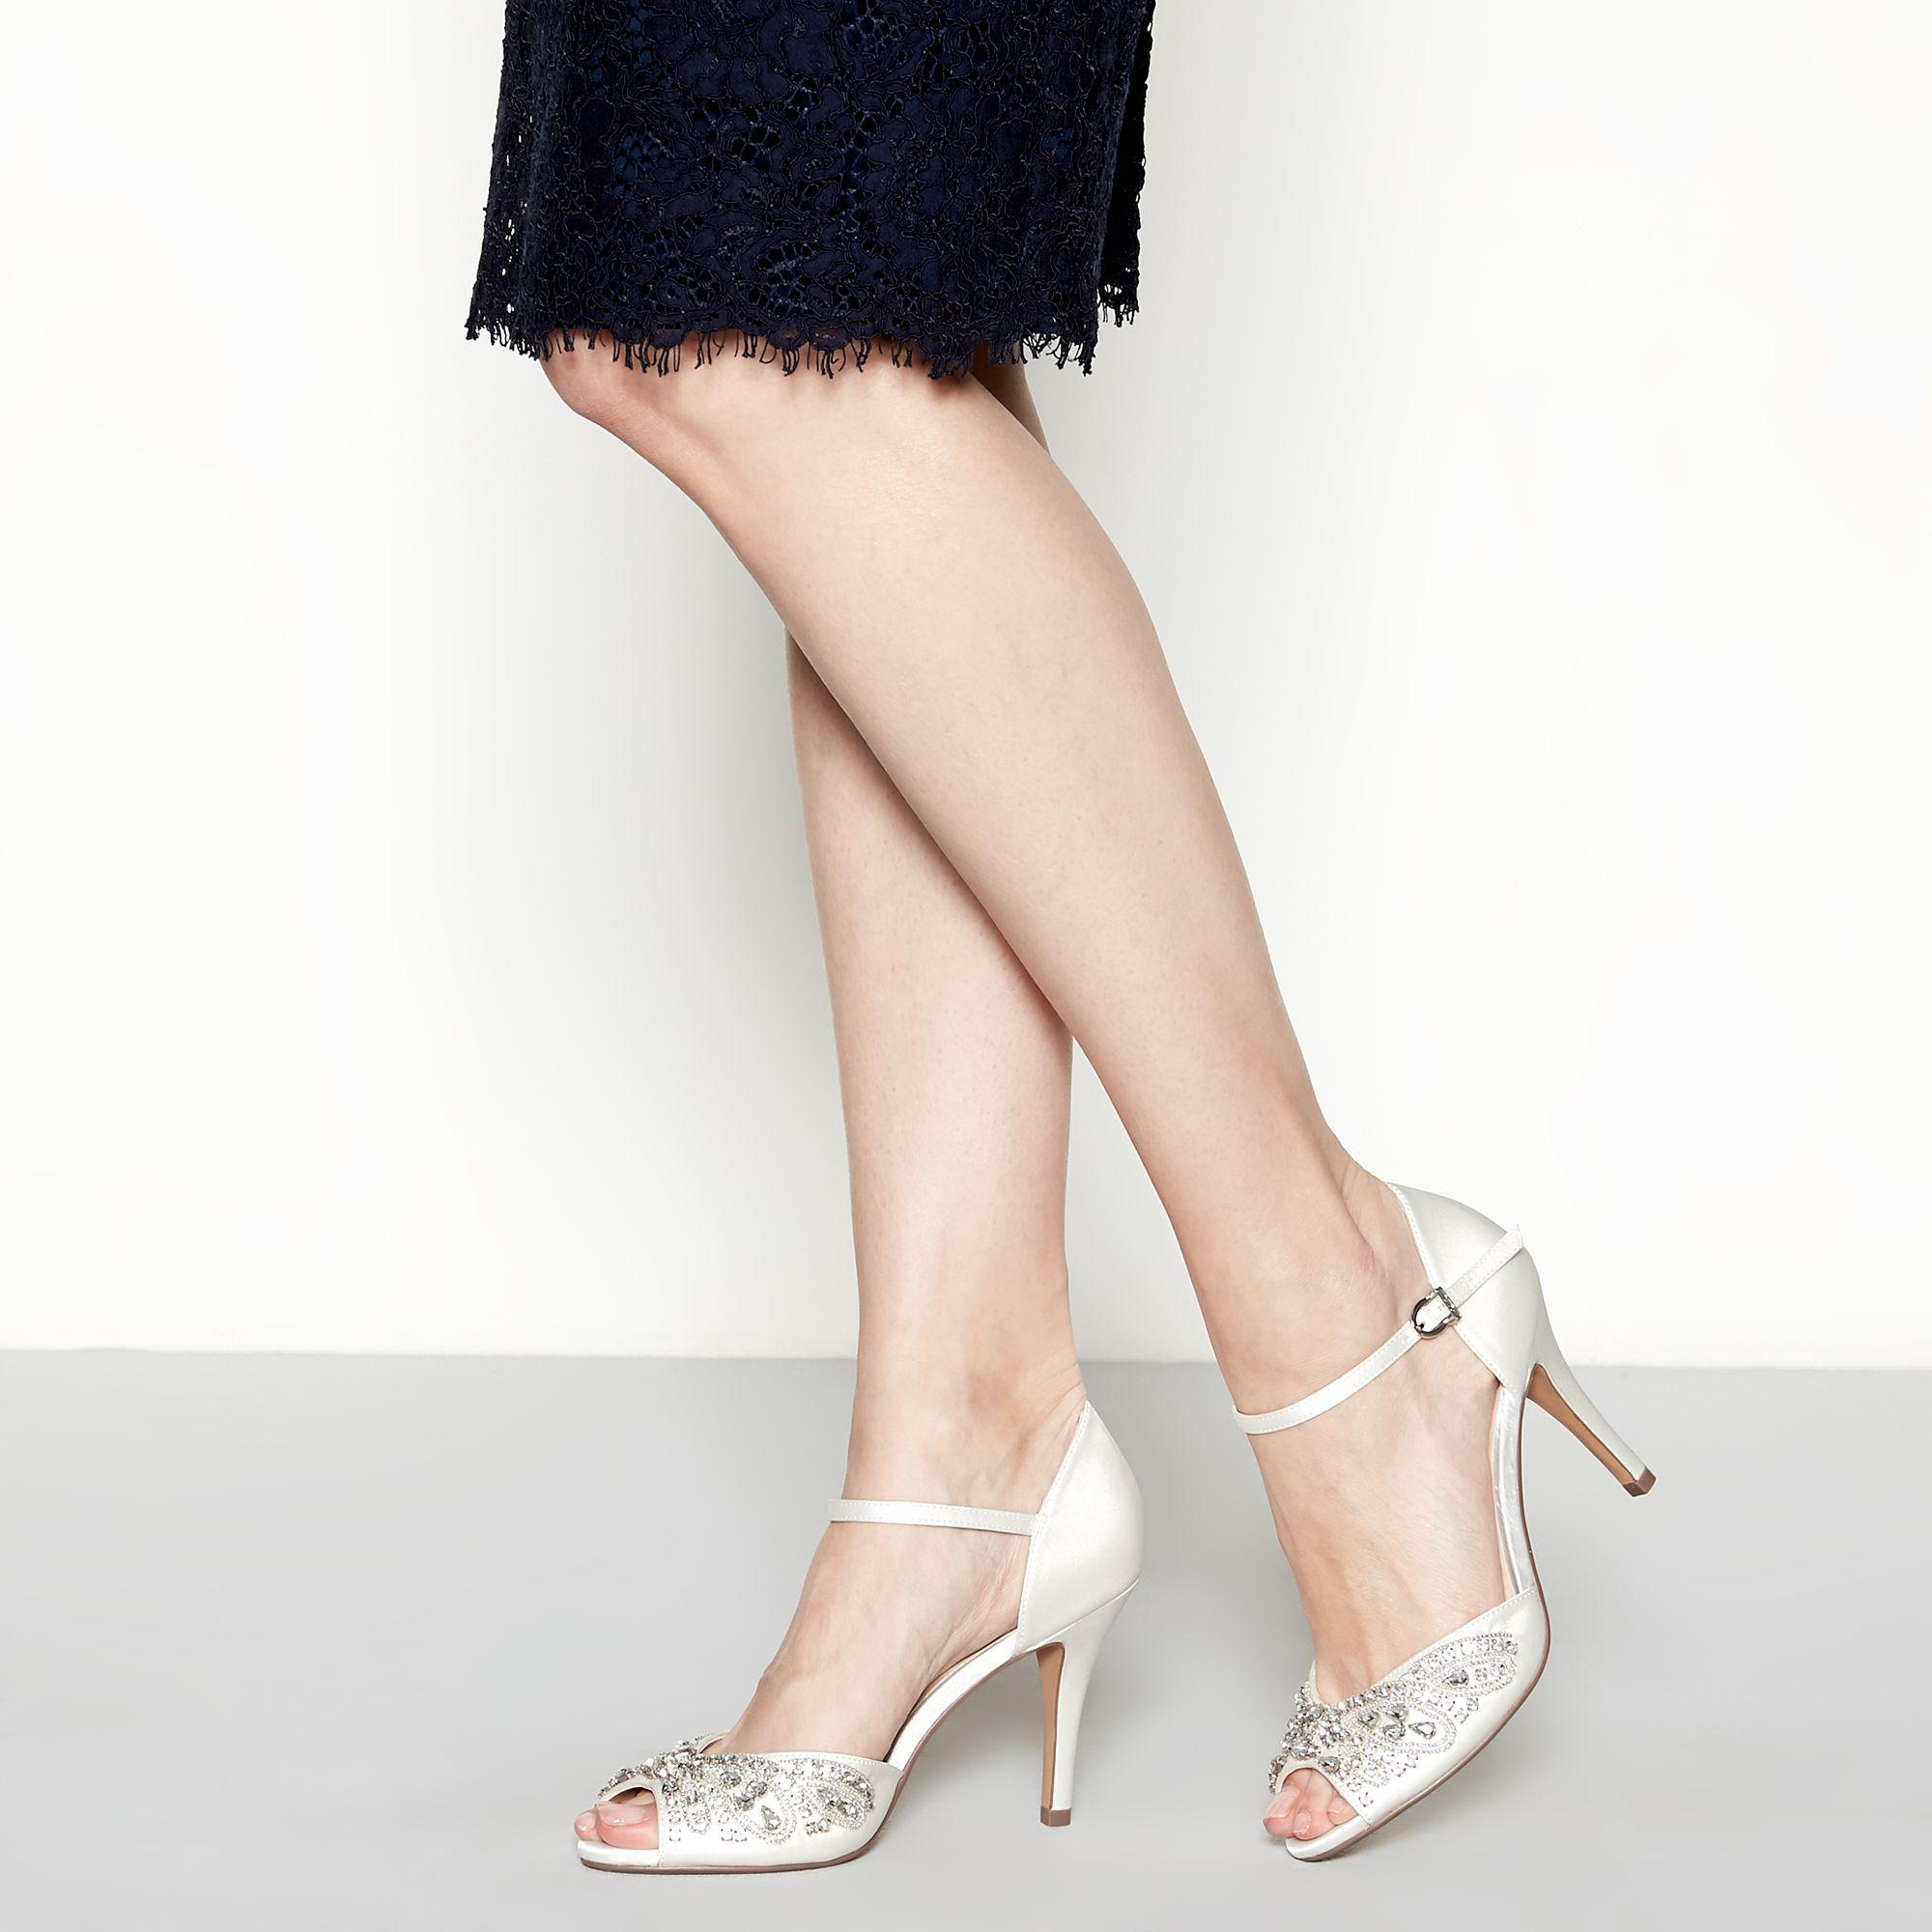 6808ef18bee Jenny Packham. Women s White Ivory Satin  paris  High Stiletto Heel Ankle  Strap Sandals